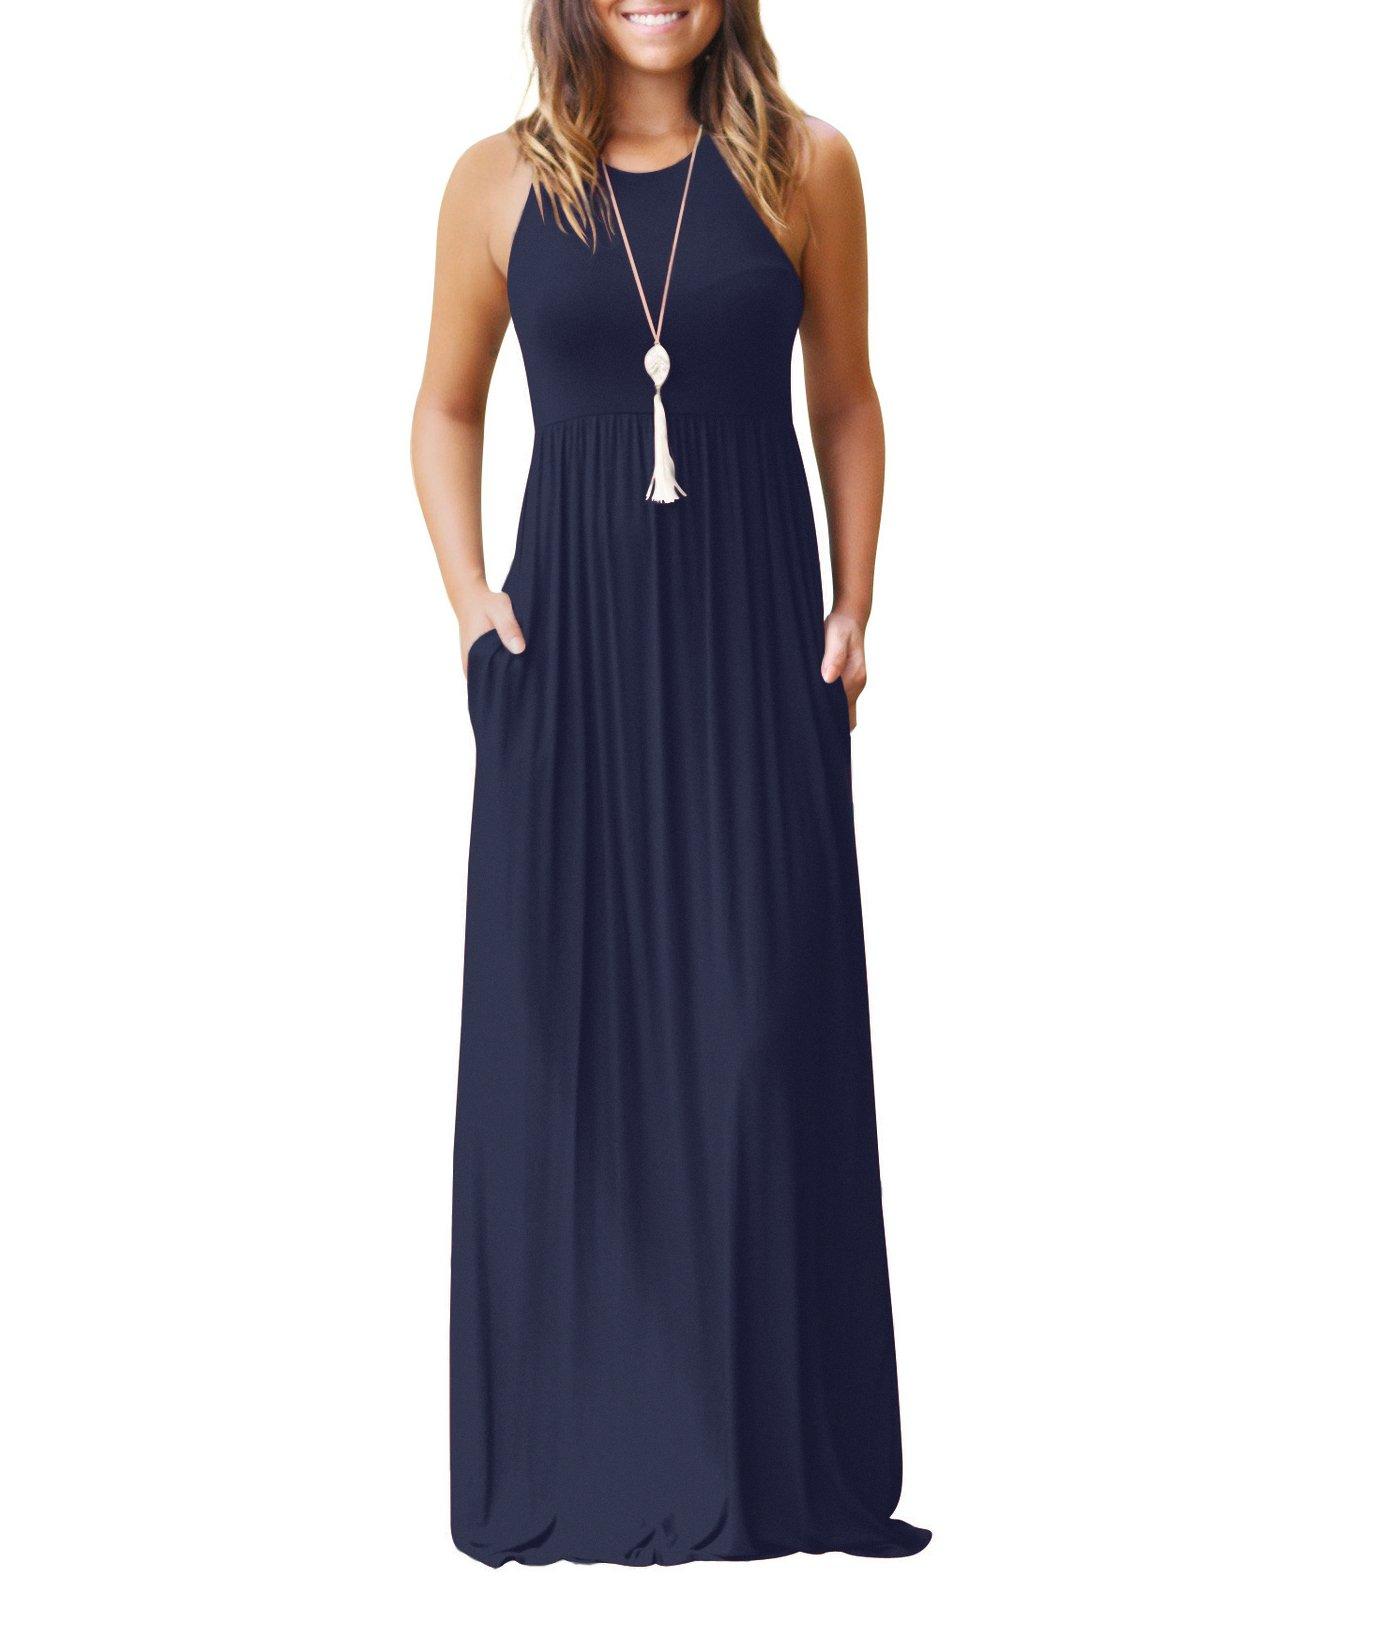 AAMILIFE Women's Sleeveless Racerback Casual Loose Plain Long Maxi Dresses with Pockets Navyblue XL